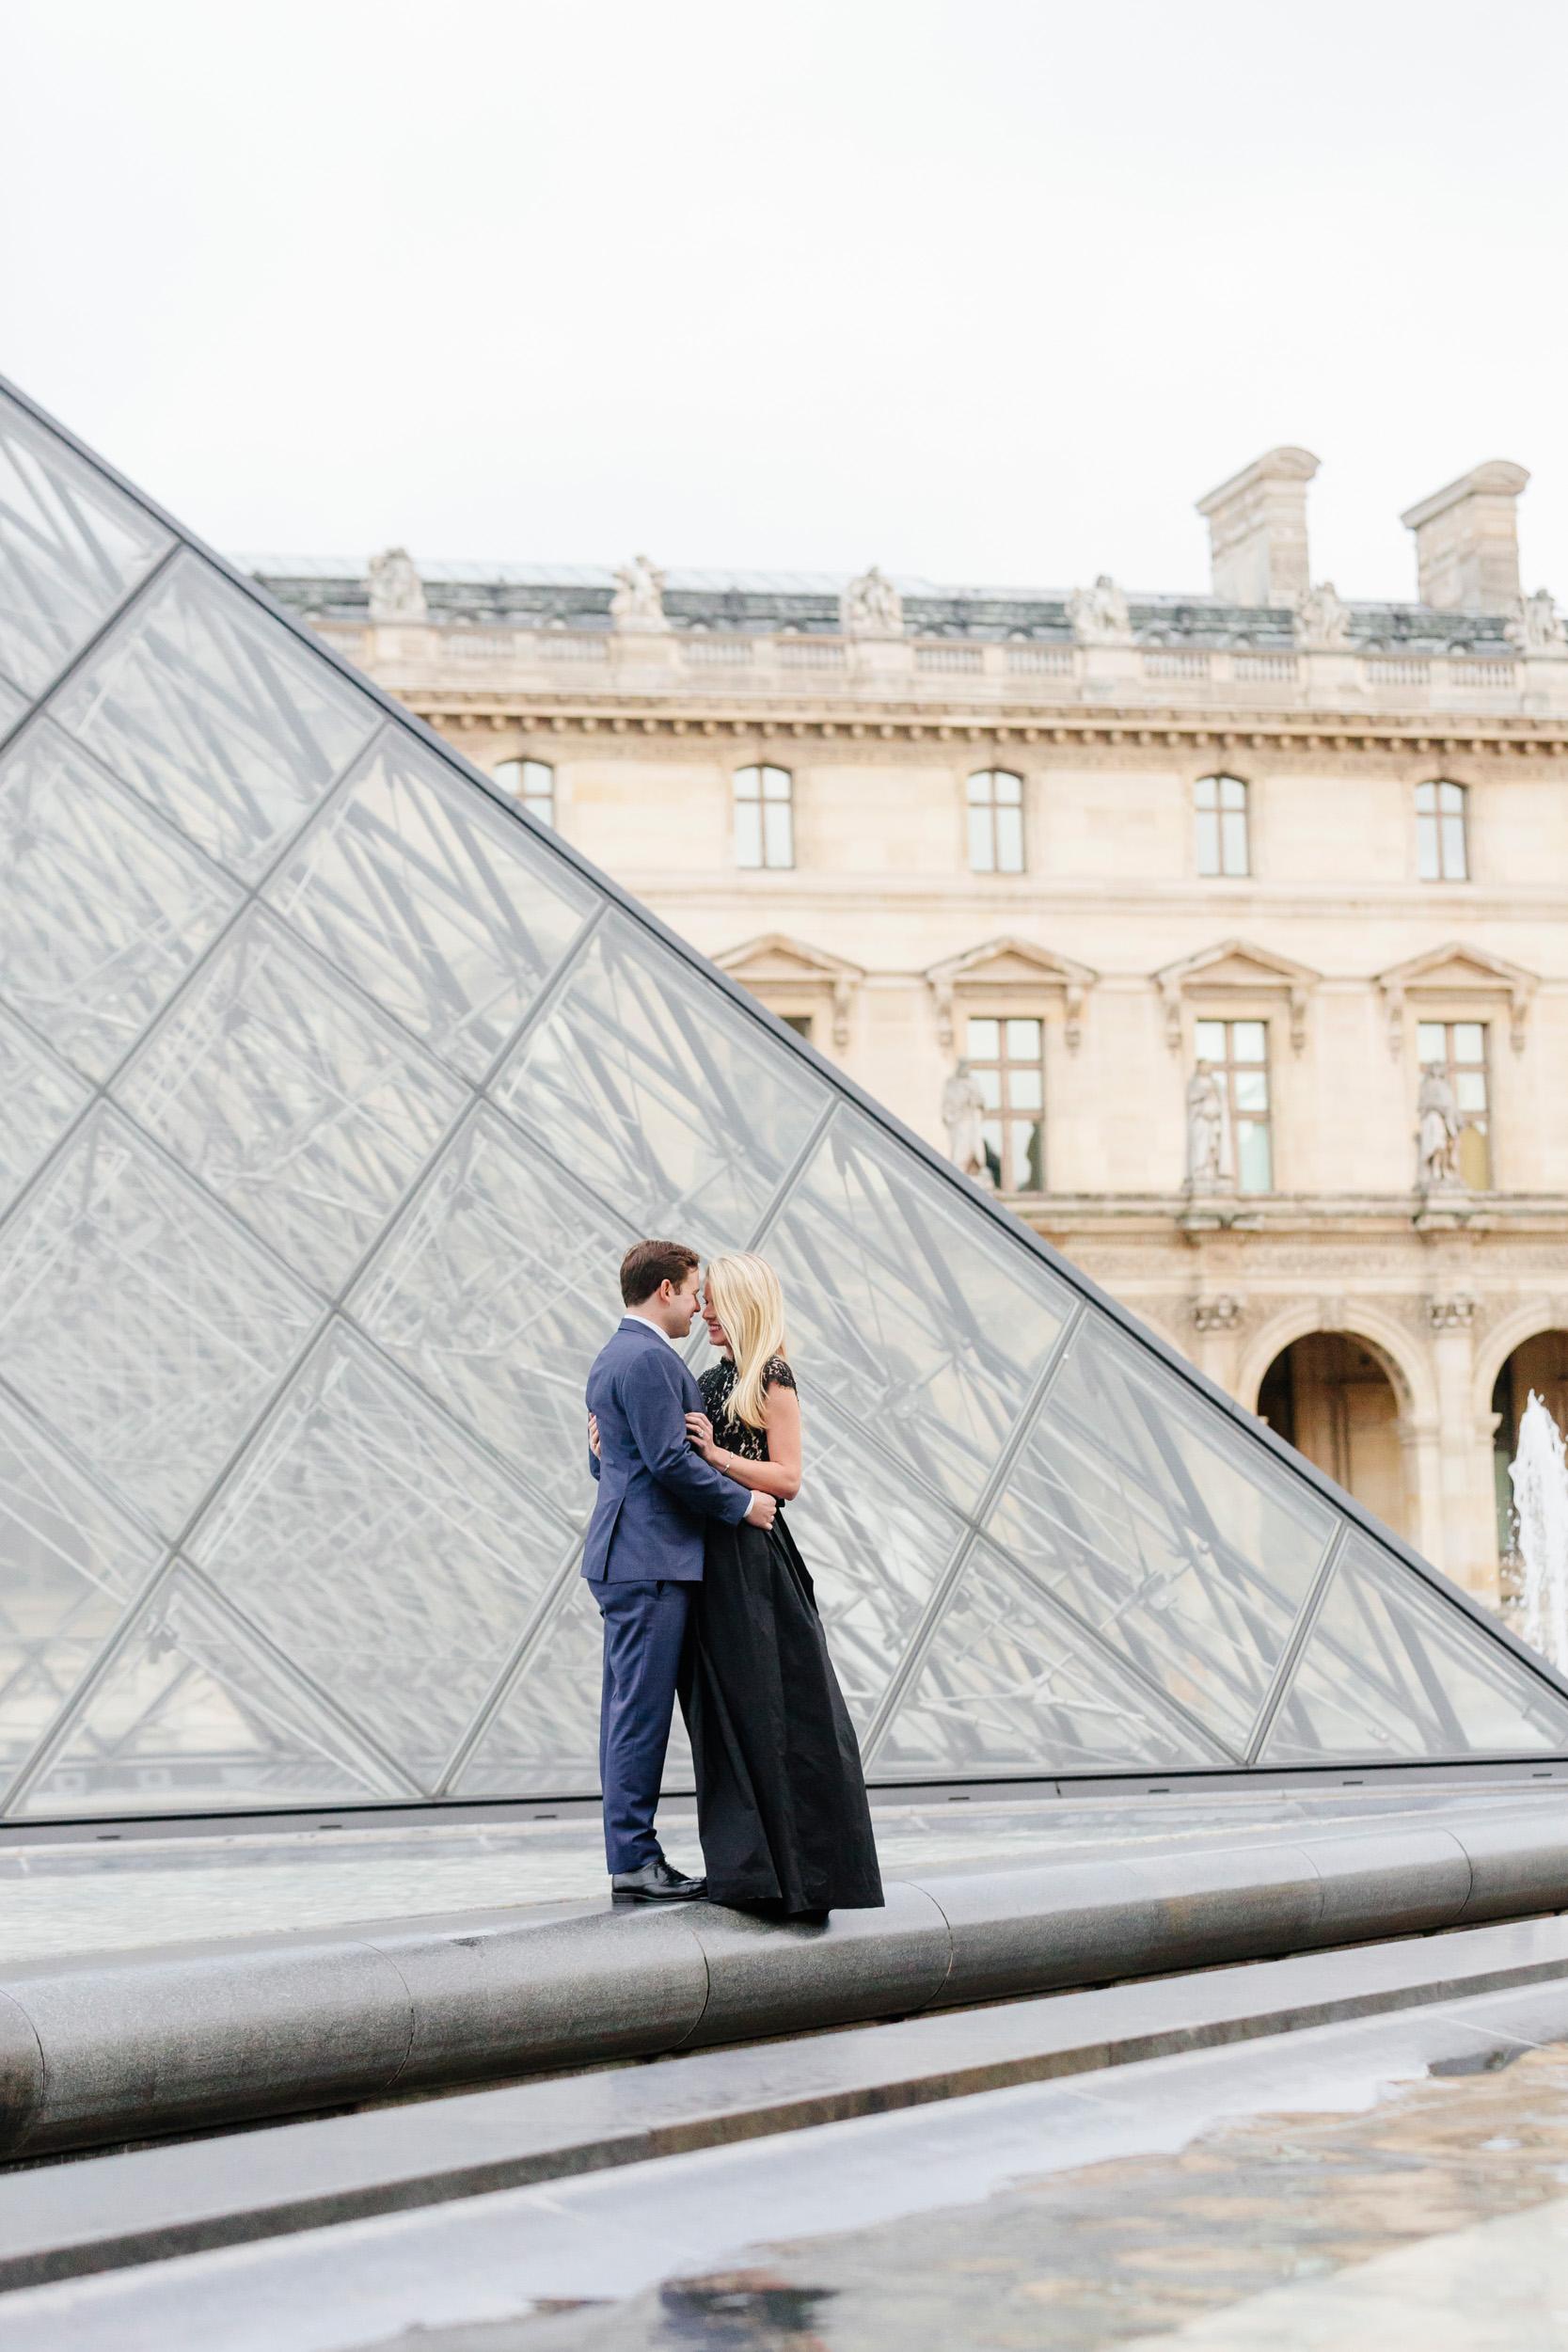 Paris vacation couple portrait standing by the Louvre Museum Pyramid captured by Paris Photographer Federico Guendel www.iheartparis.fr